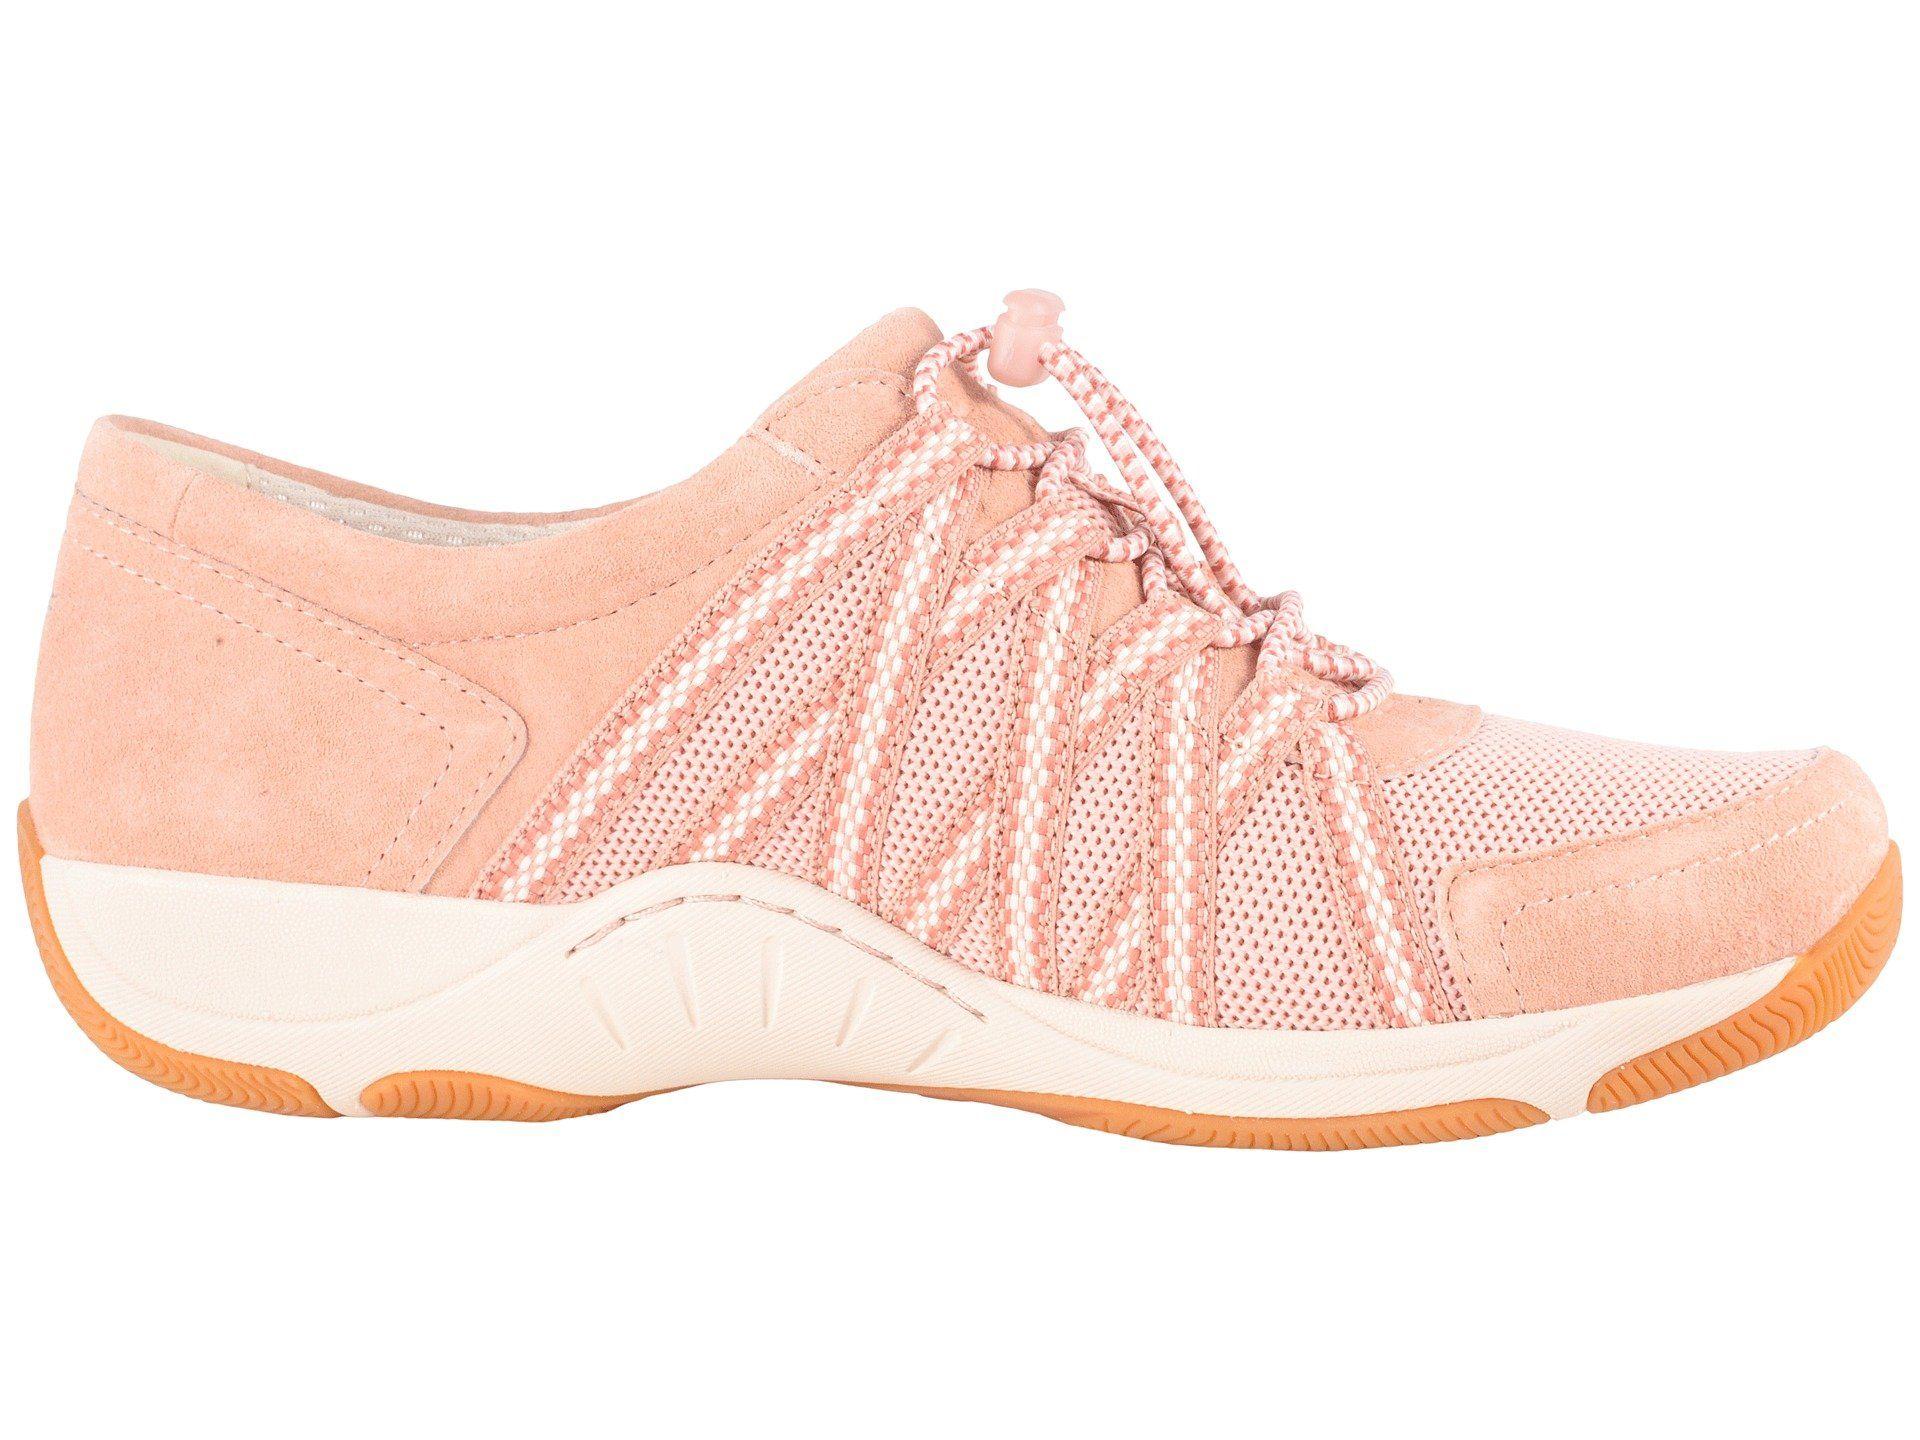 8d2678d3f01f3 Best Walking Shoes - Most Comfortable Shoes 2019